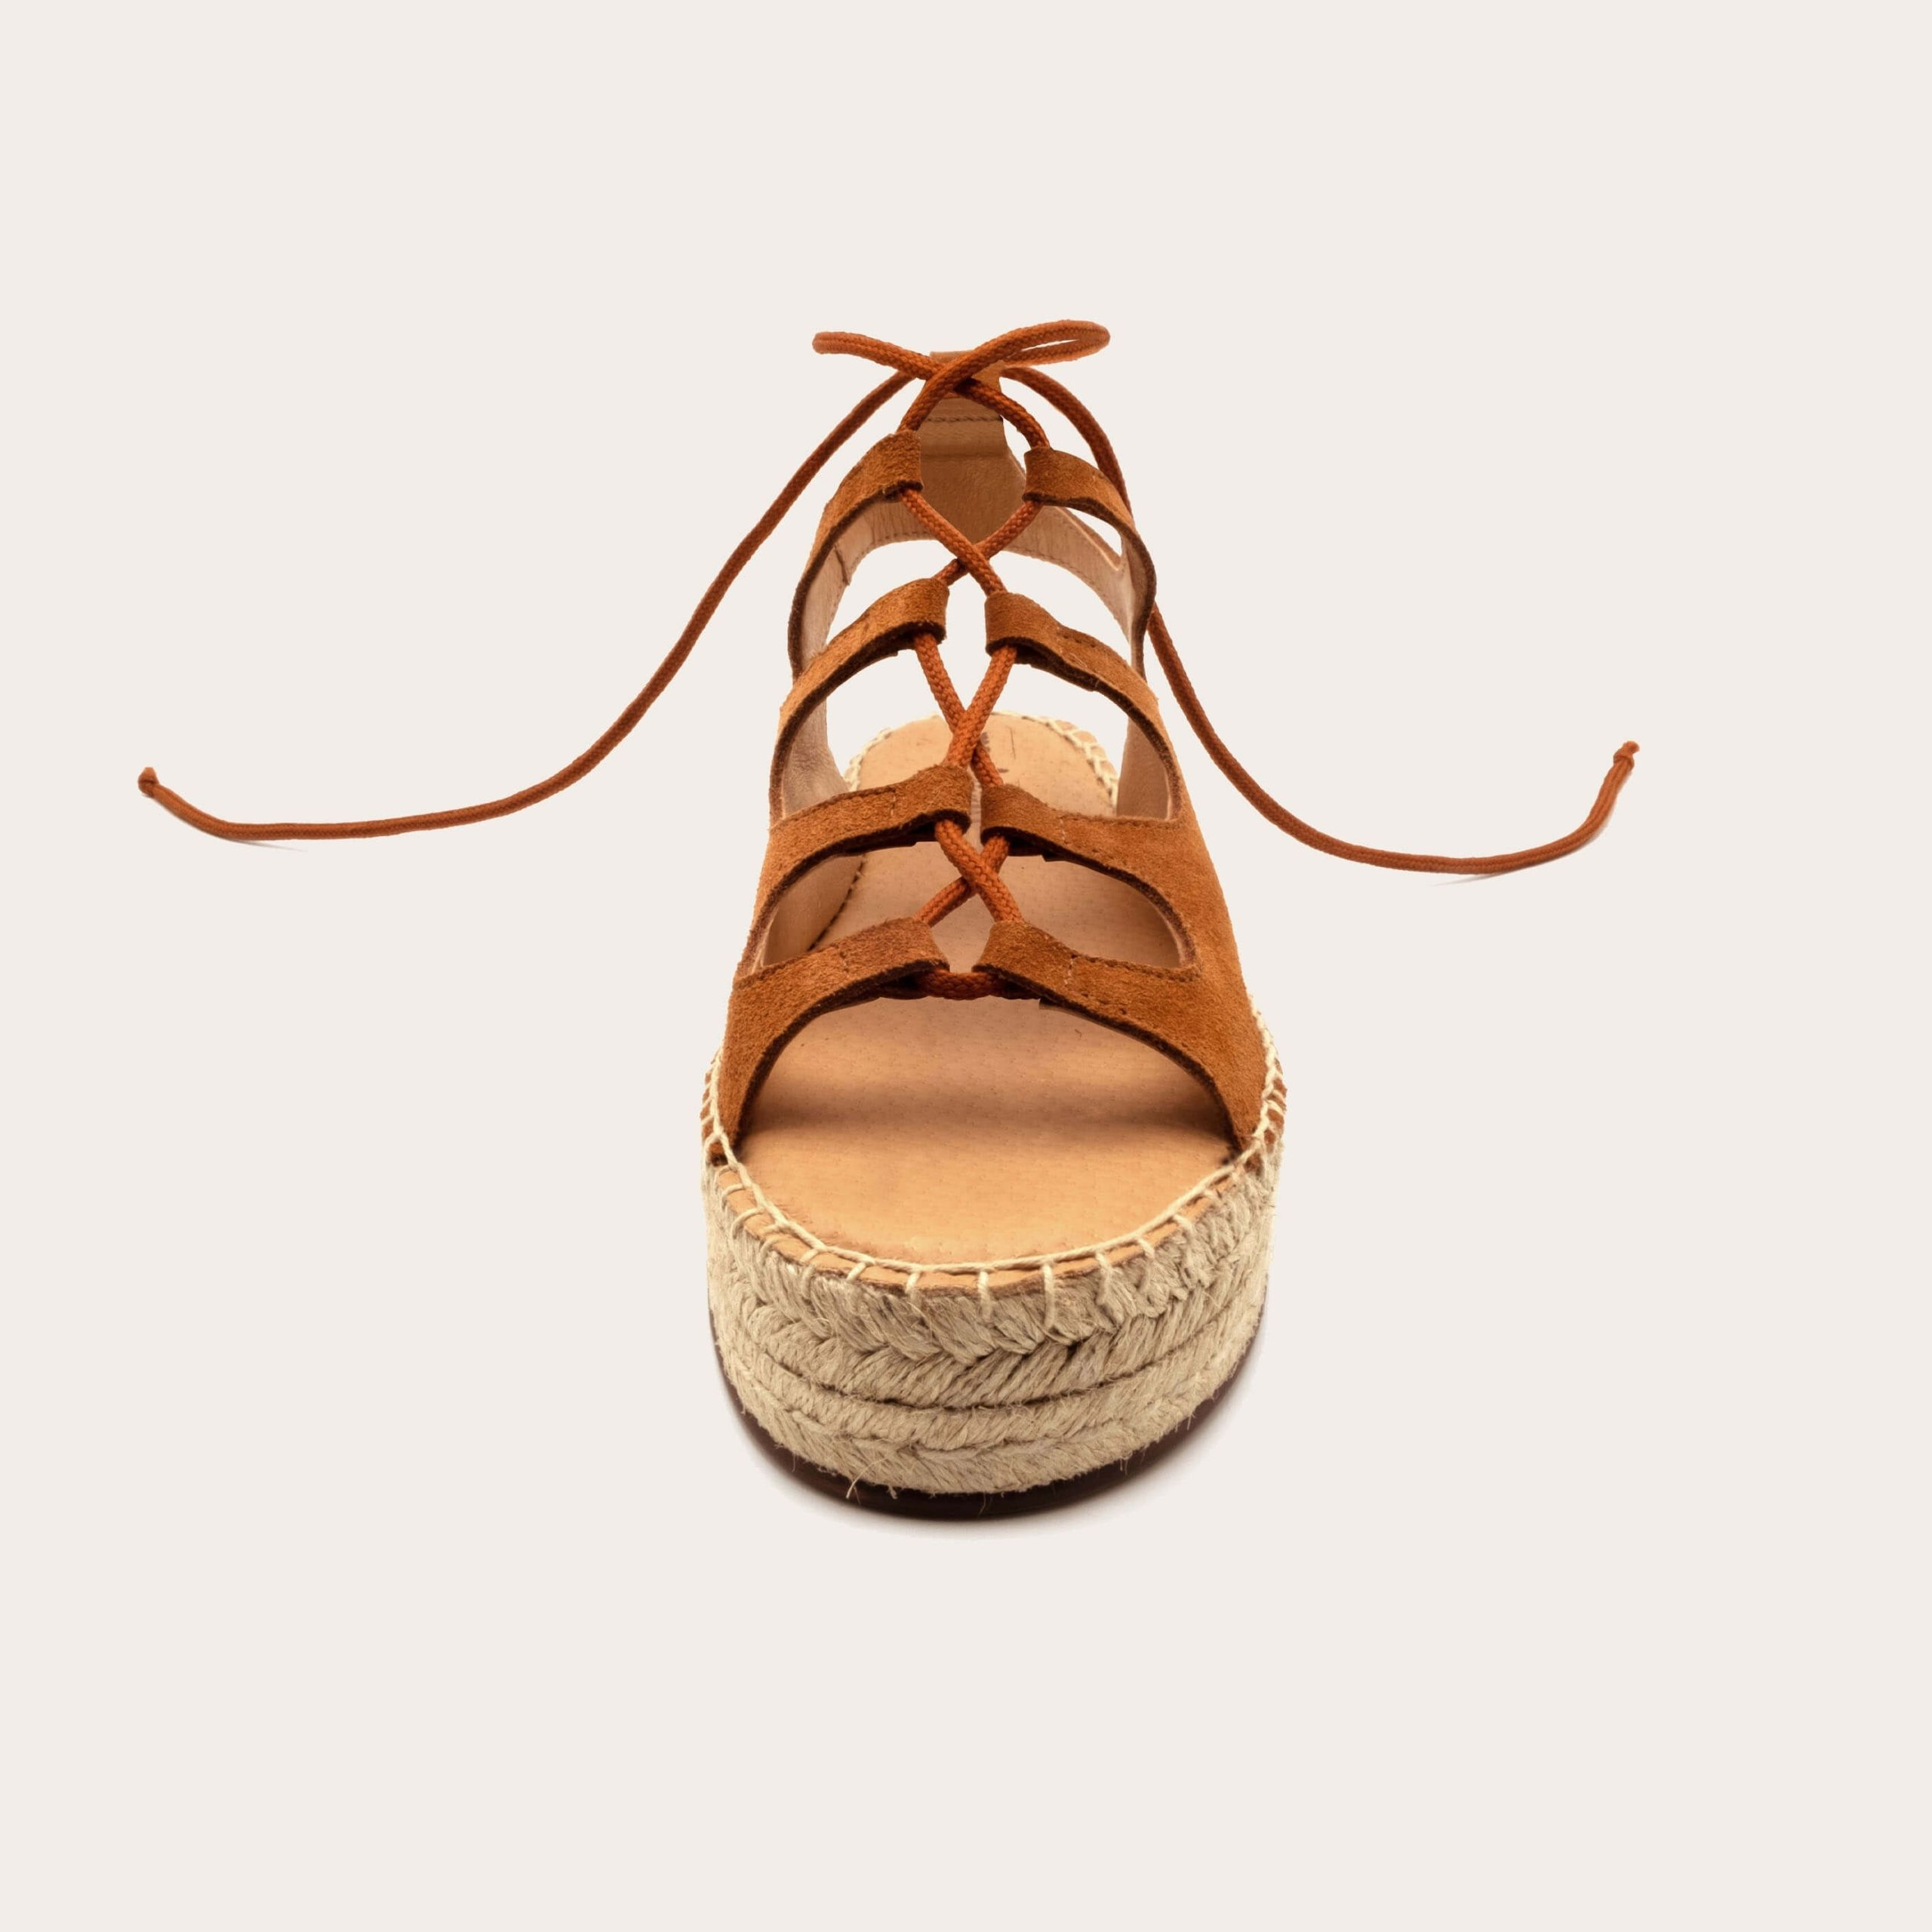 rafa-brown_3_lintsandalen sandals travelsandals vegan sustainable sandals wikkelsandalen